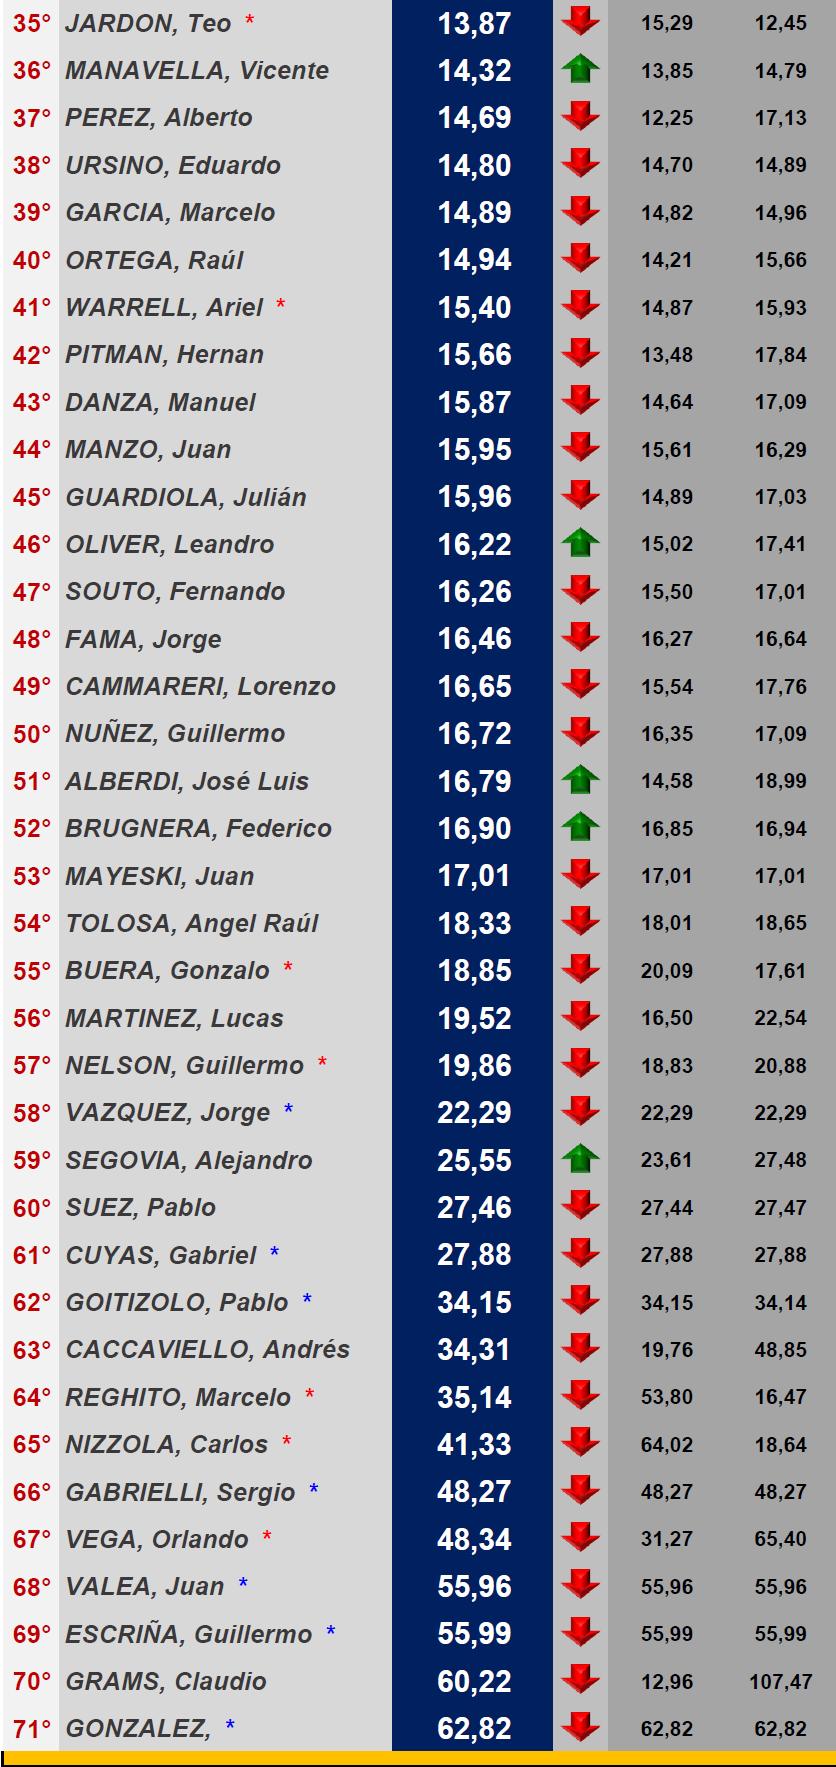 Ranking de Pilotos Temporada 2018 ▬▬ May/Jun Rankin12